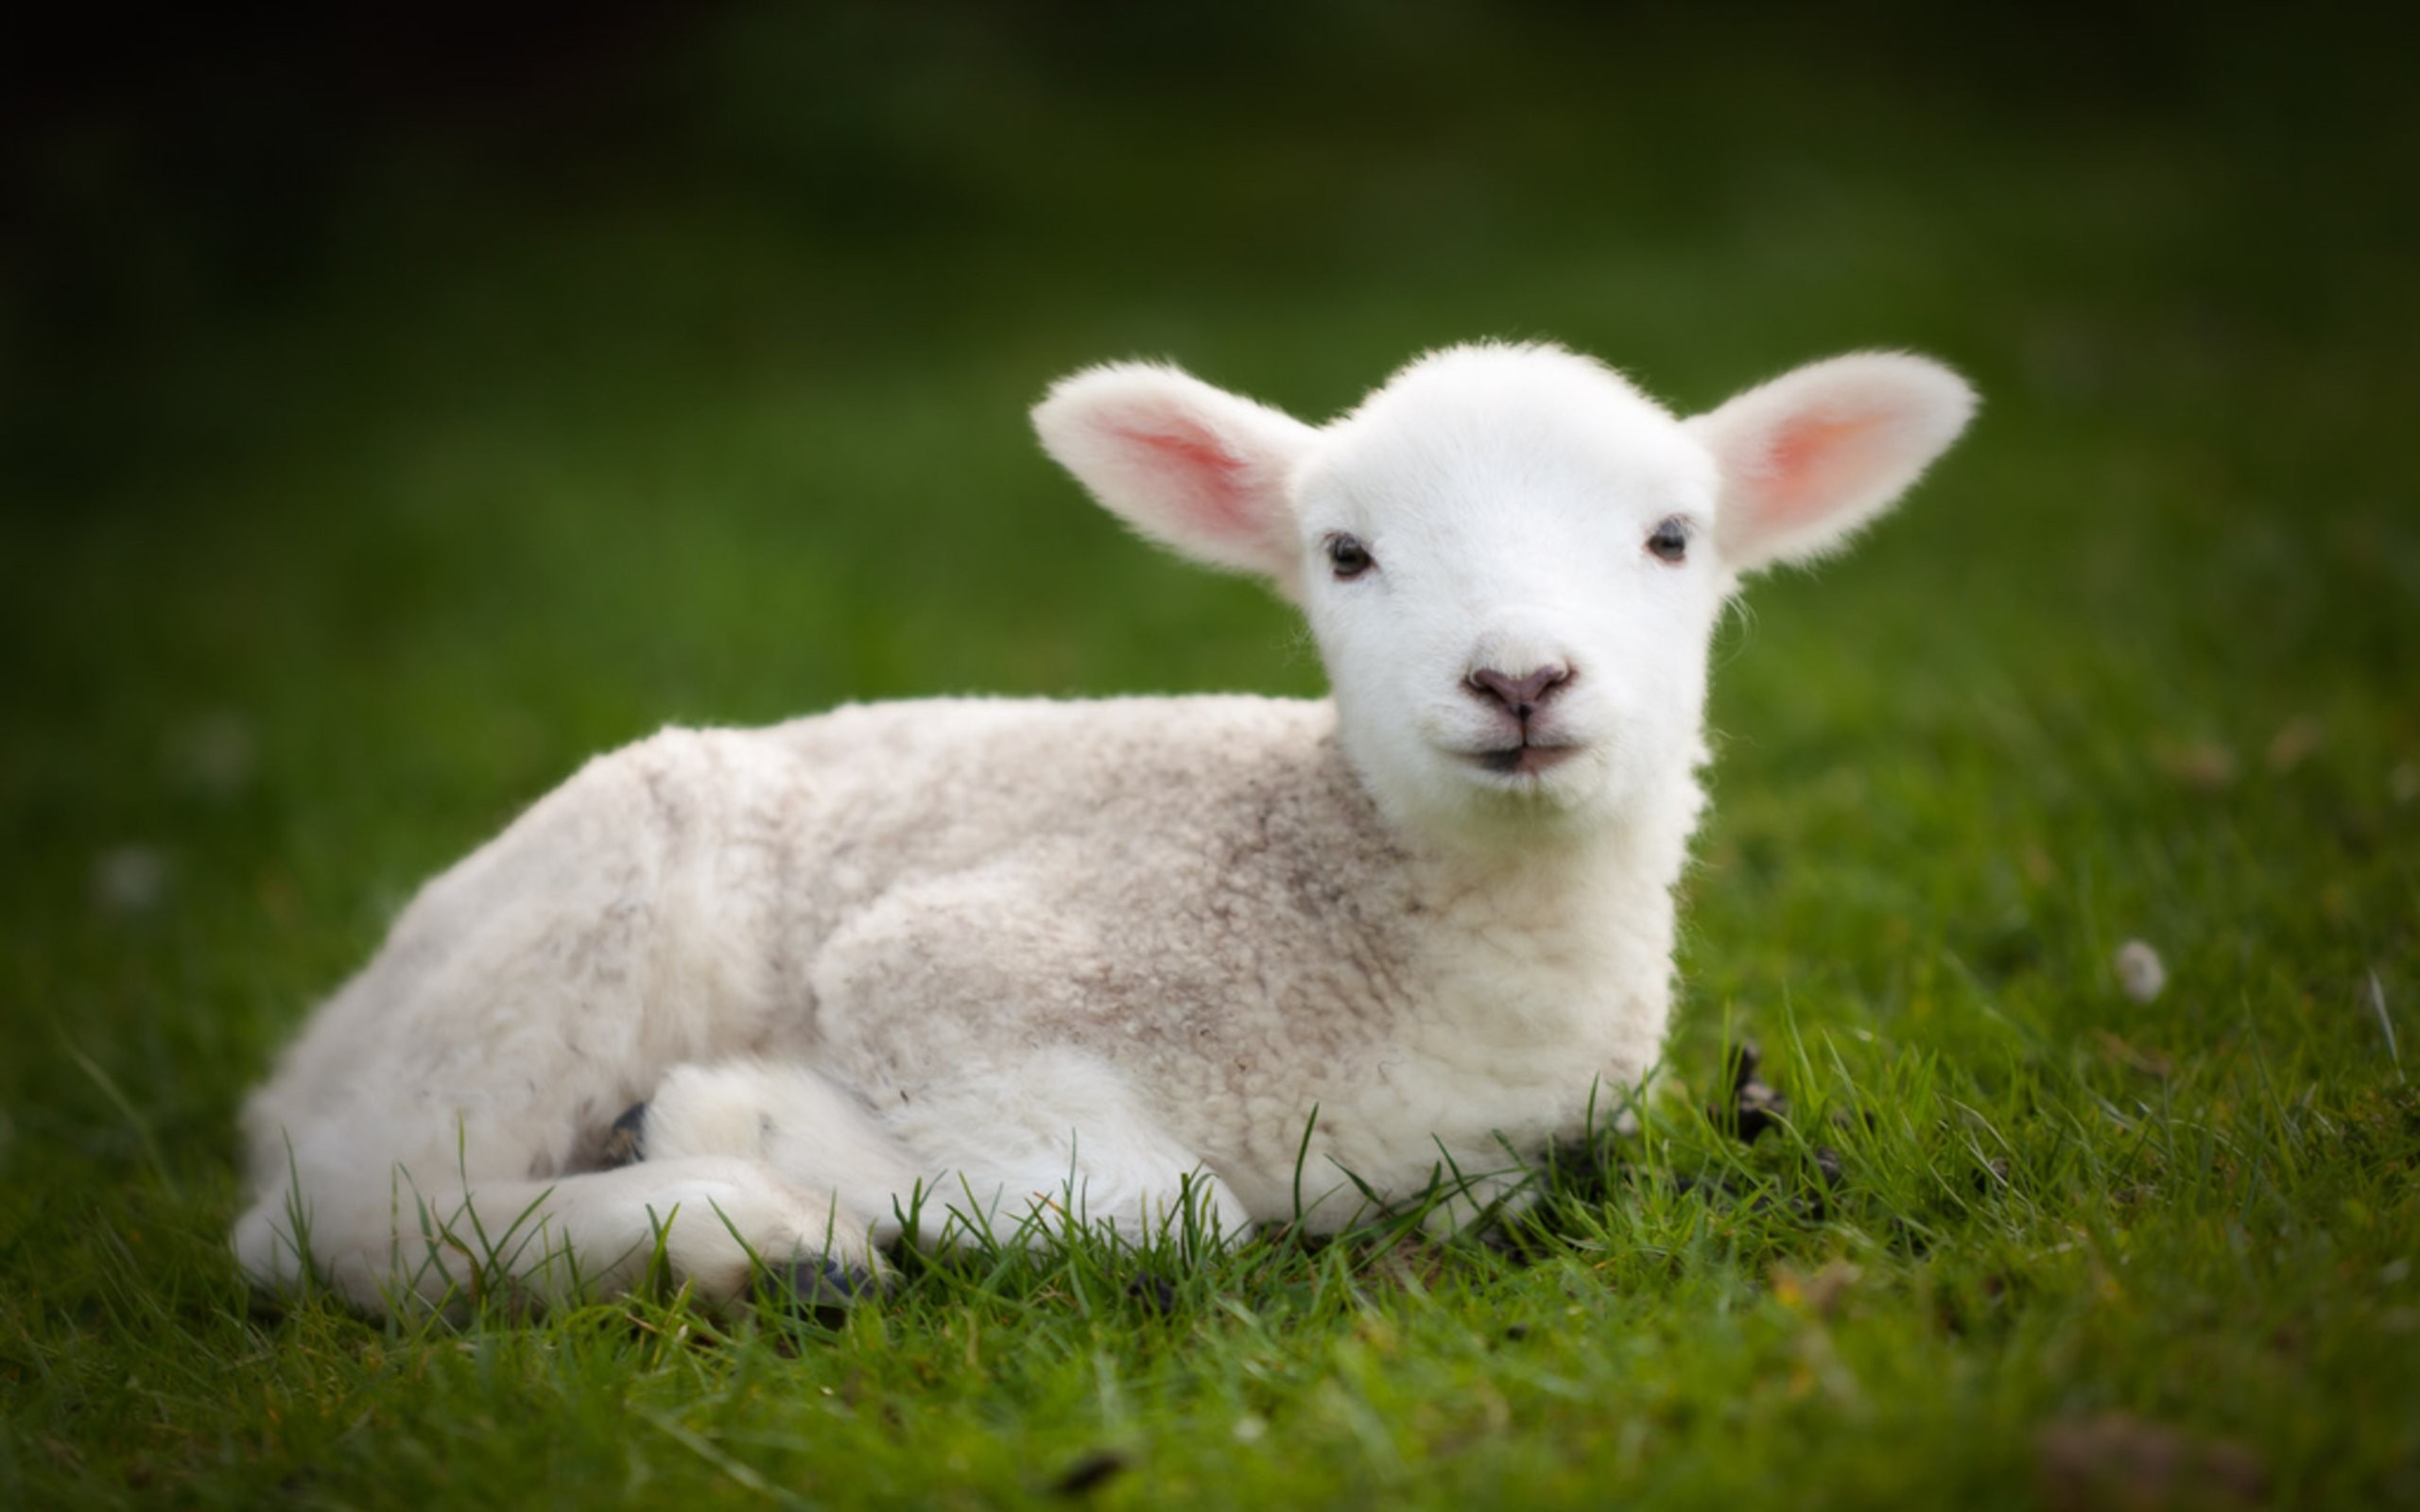 Cute baby sheep wallpapers